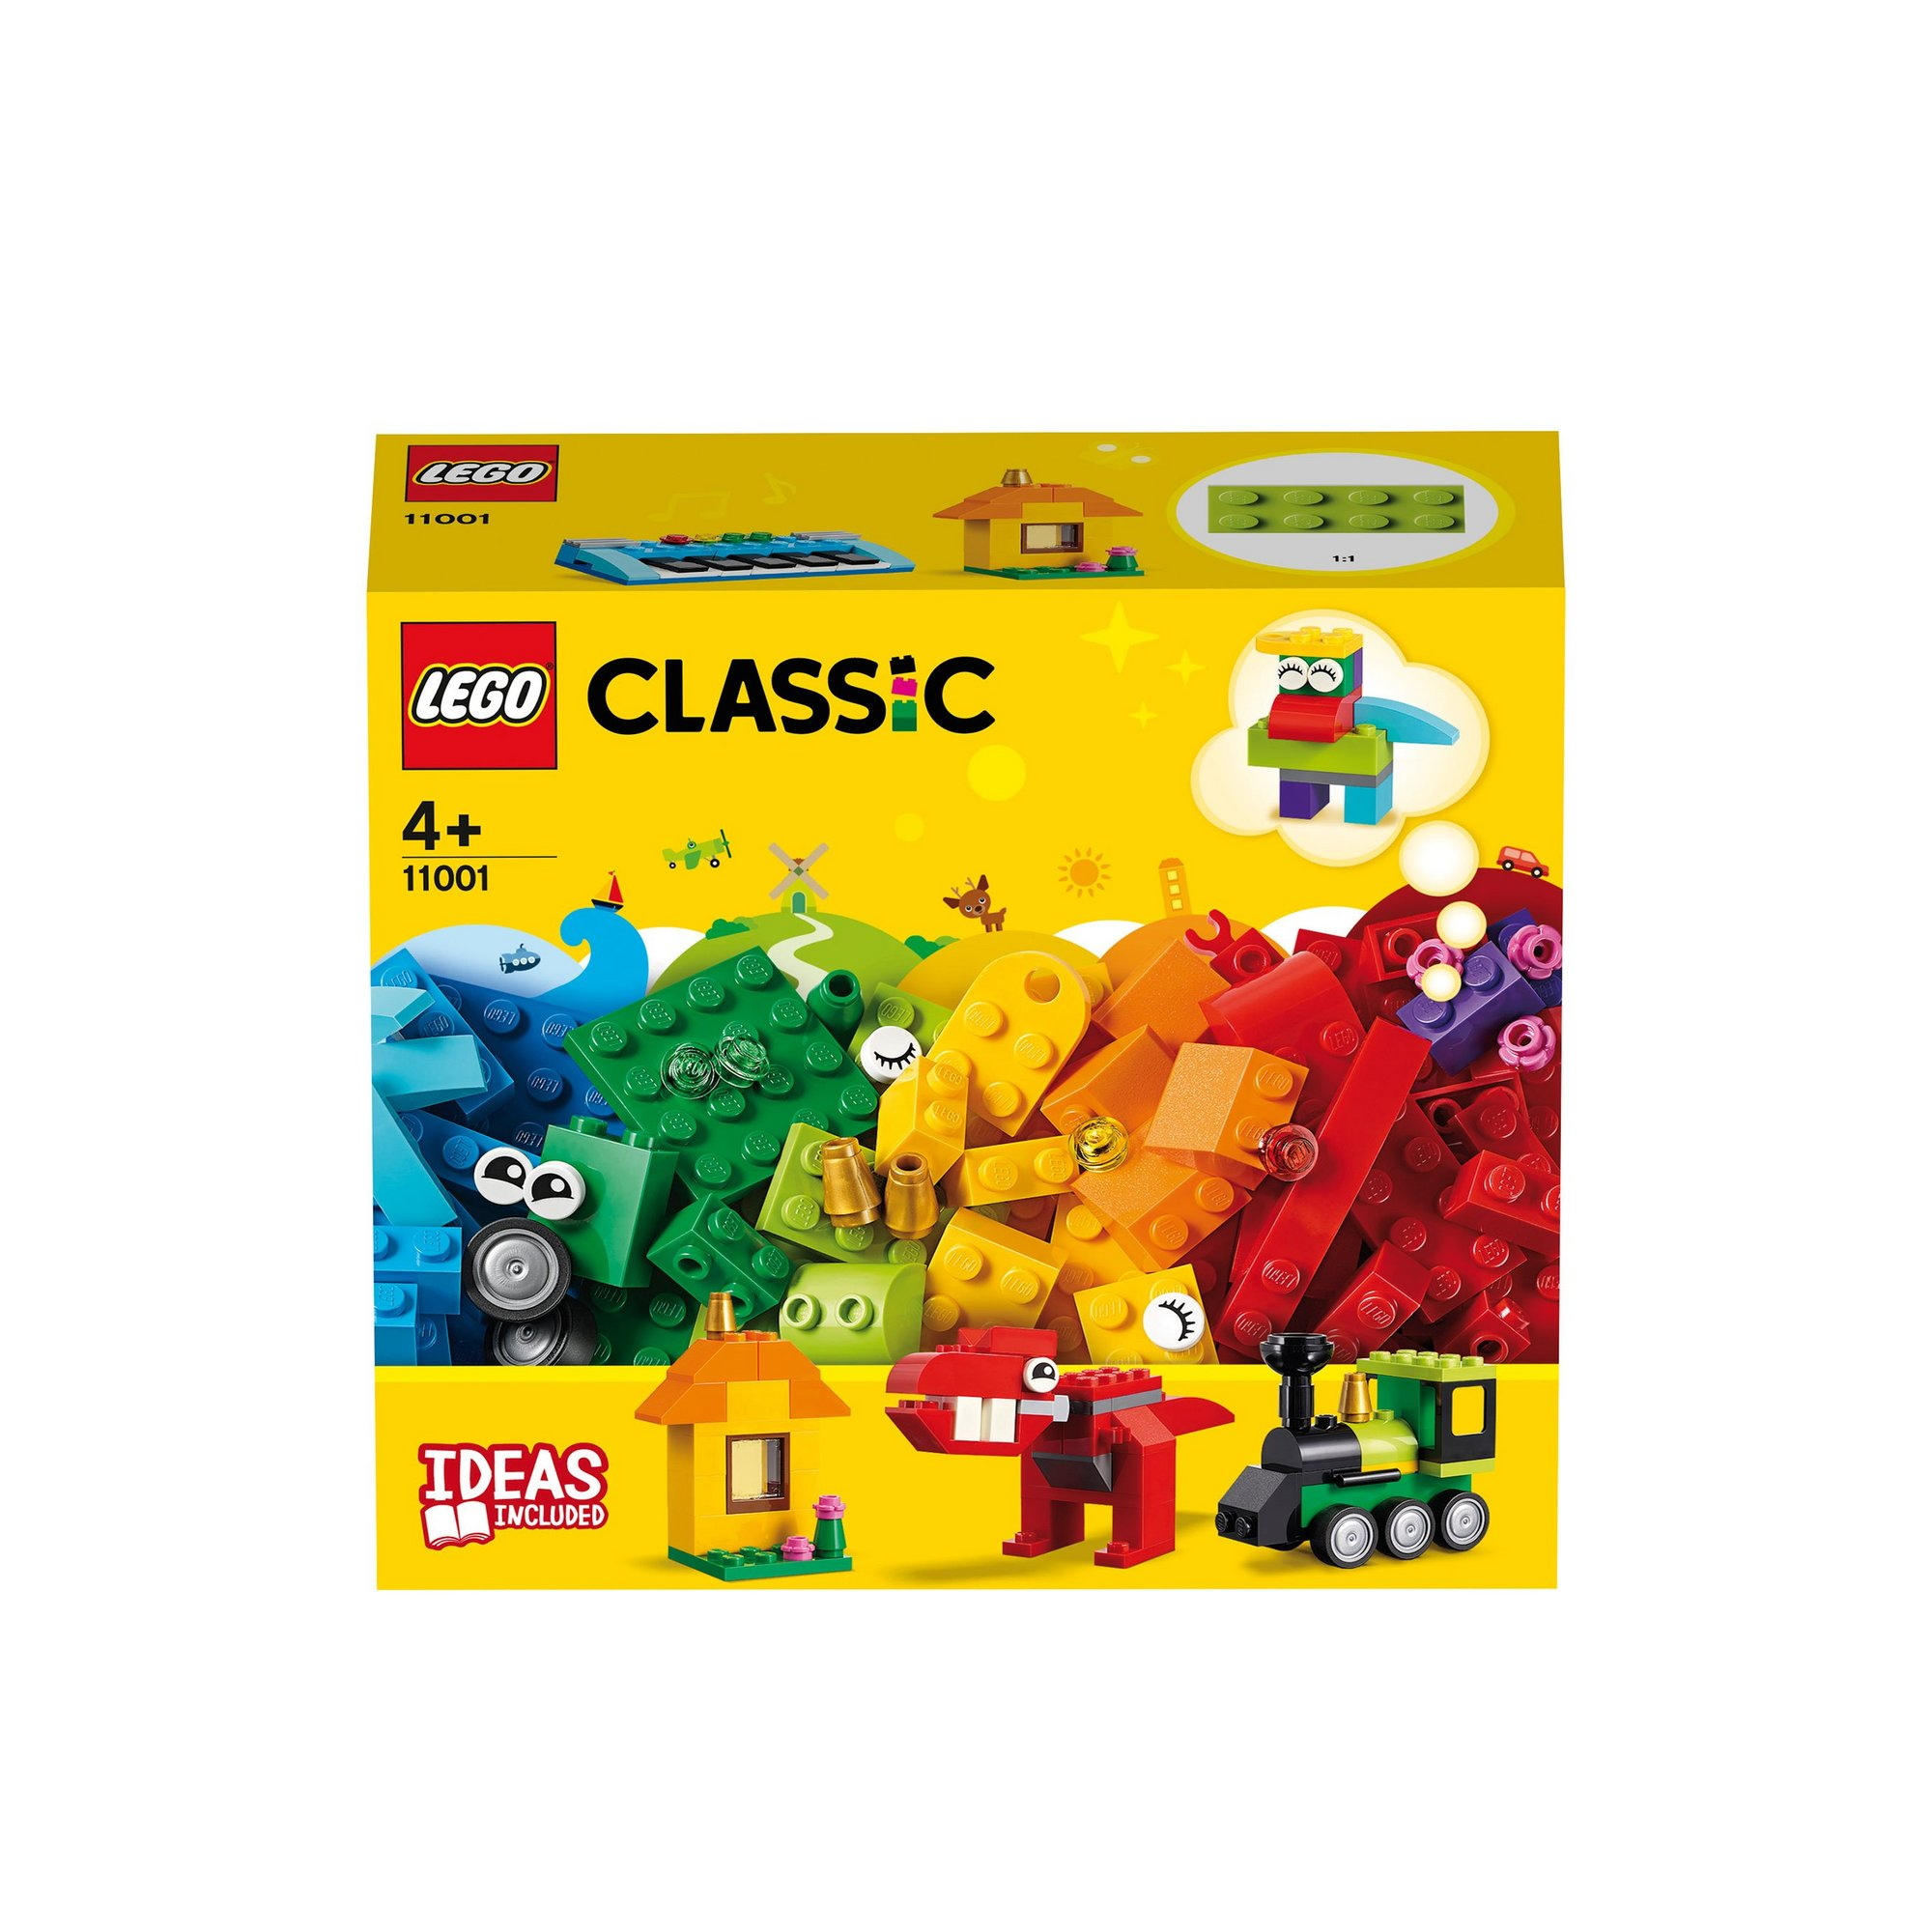 Image of LEGO Classic Bricks and Ideas